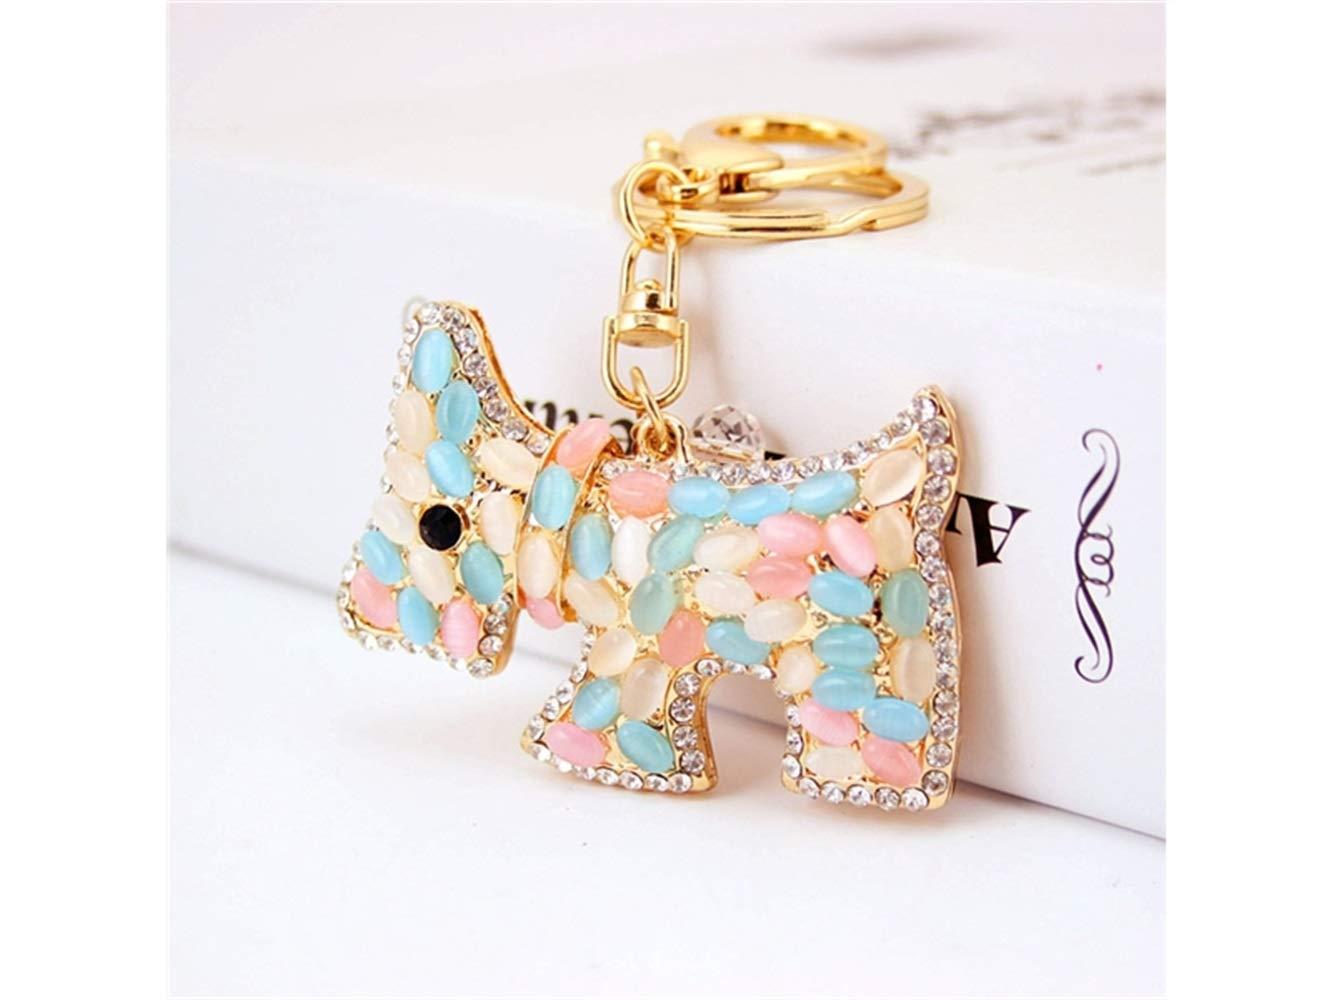 Car Keychain, Creative Exquisite Opal Dog Keychain Animal Key Trinket Car Bag Key Holder Decorations(Colorful) for Gift